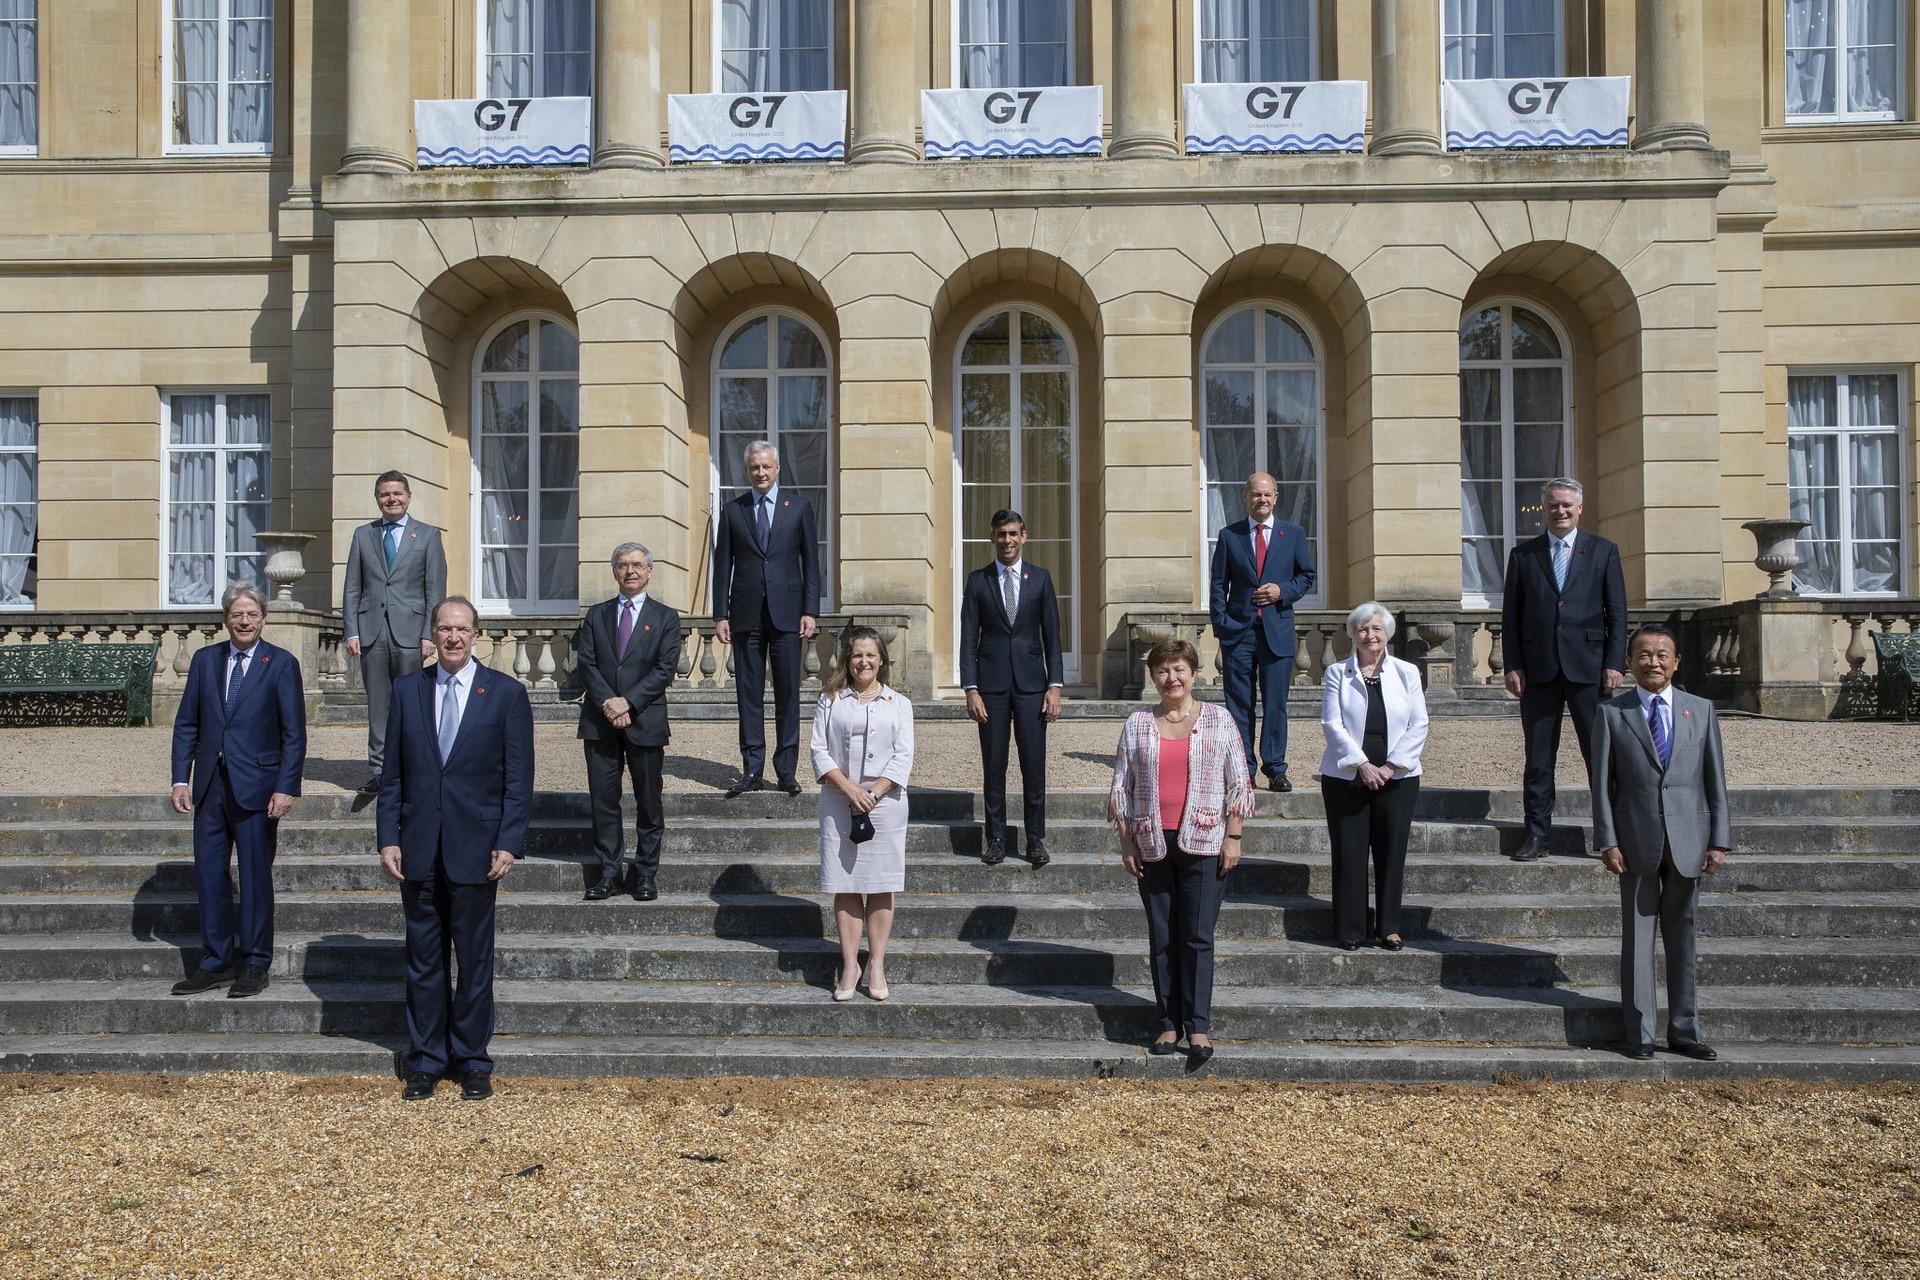 Big Tech stock falls after G7 tax deal could stop them dodging public bills